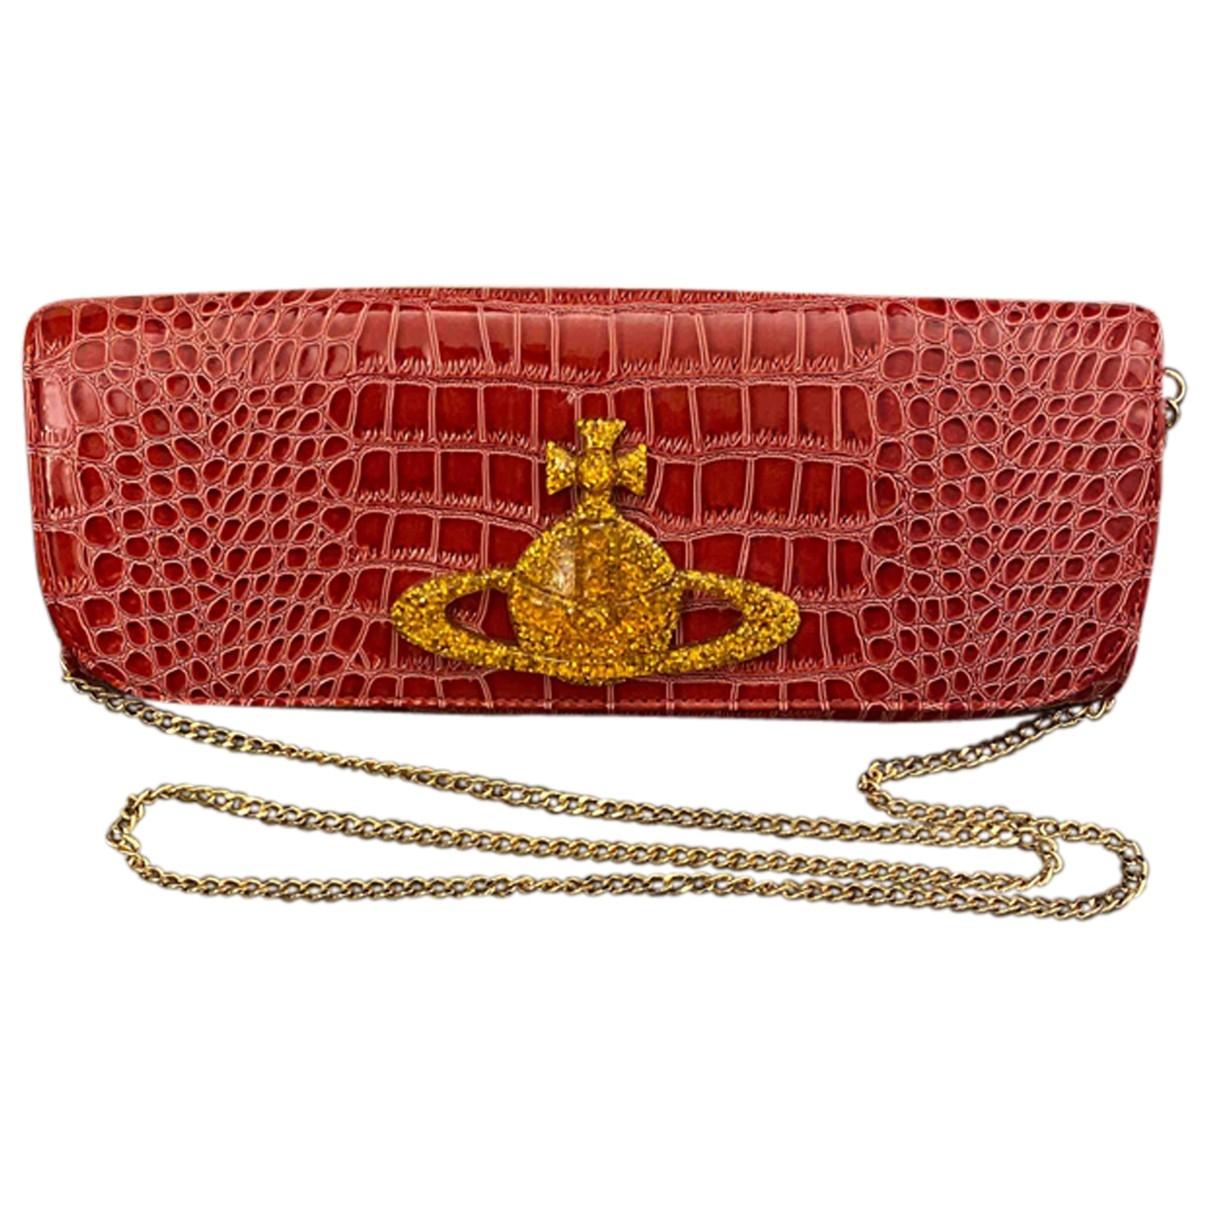 Vivienne Westwood \N Red Patent leather handbag for Women \N